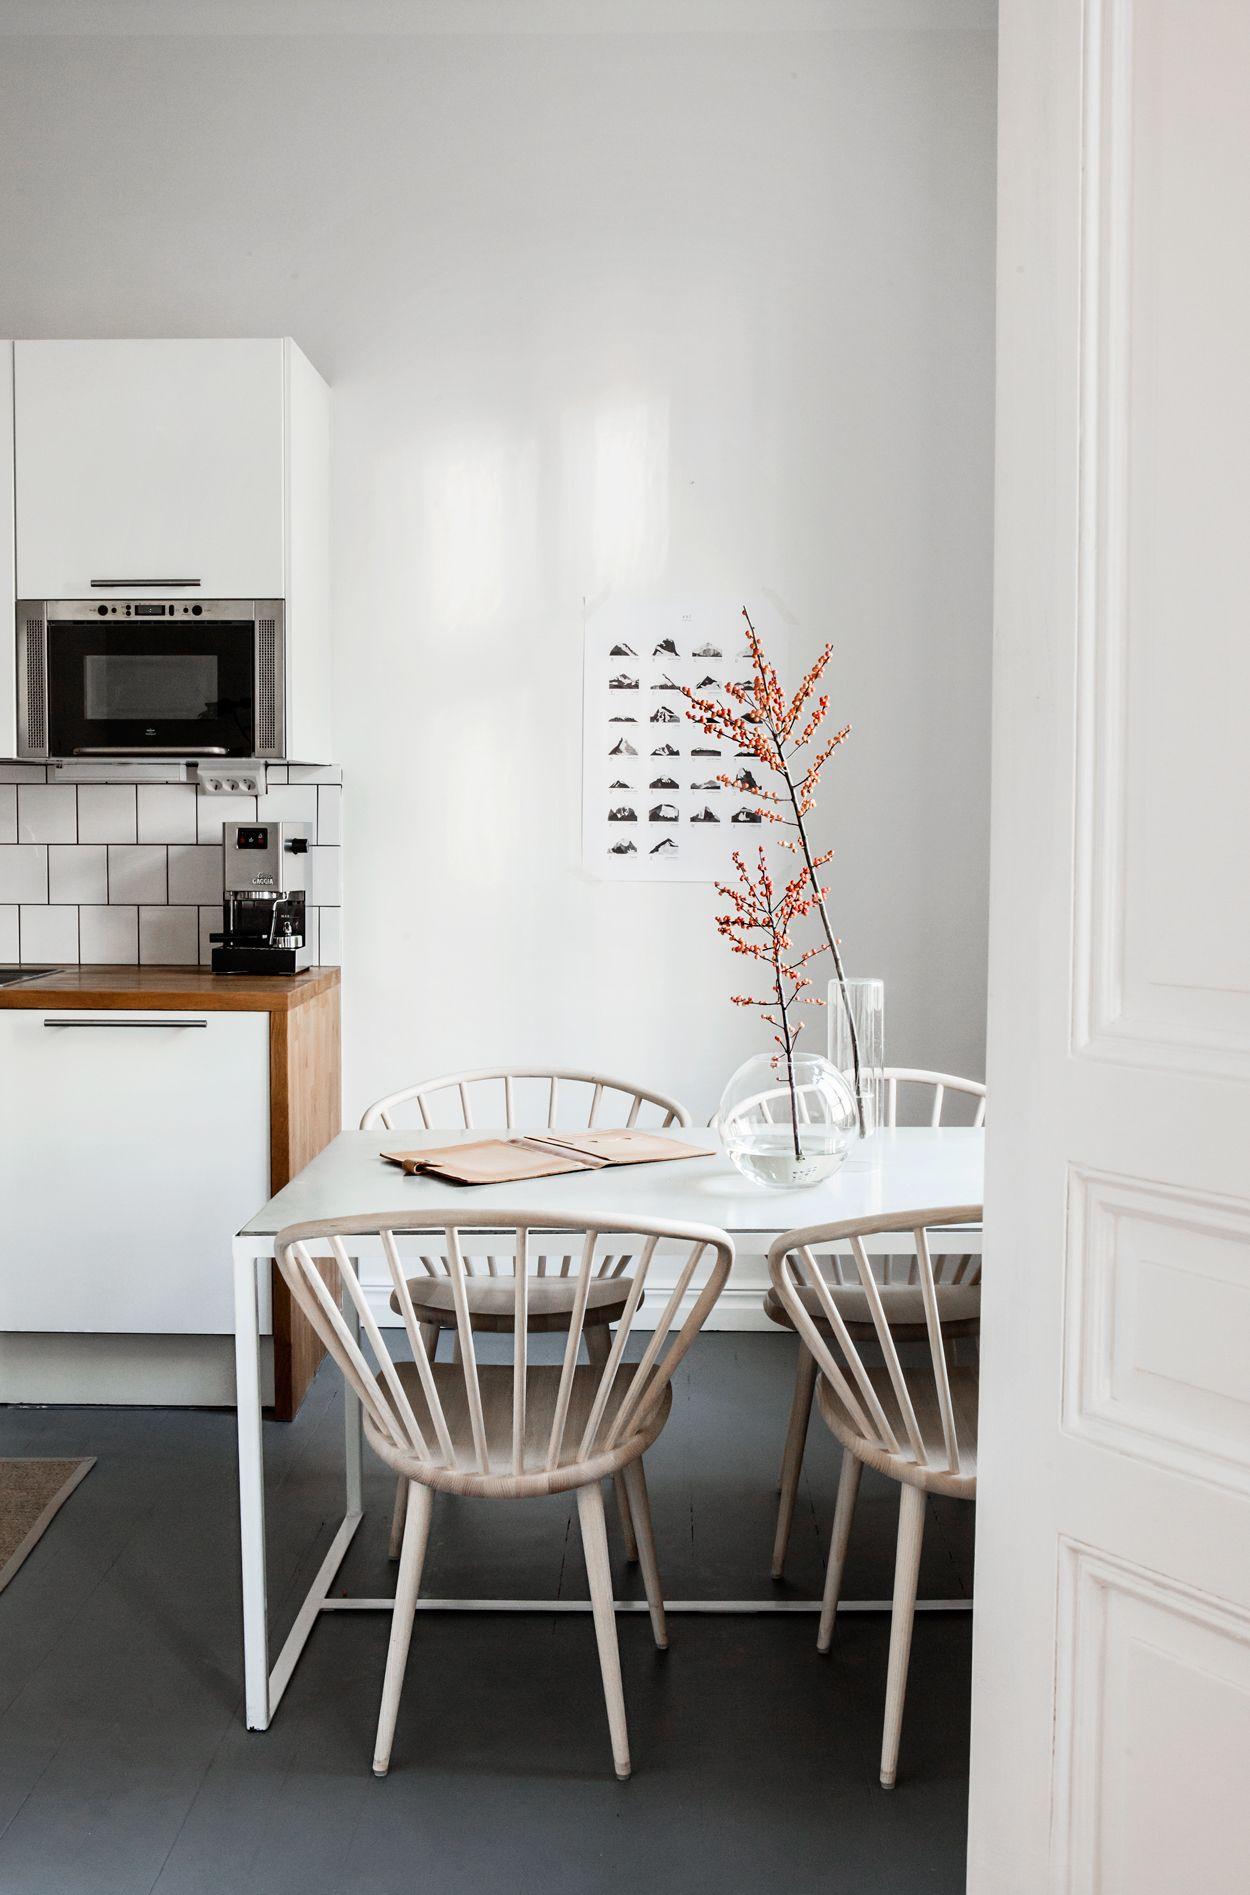 Dailydesigner Eldhuskrokur Pinterest Home Kitchen And Interior - Arsenalsgatan-4-a-king-height-apartment